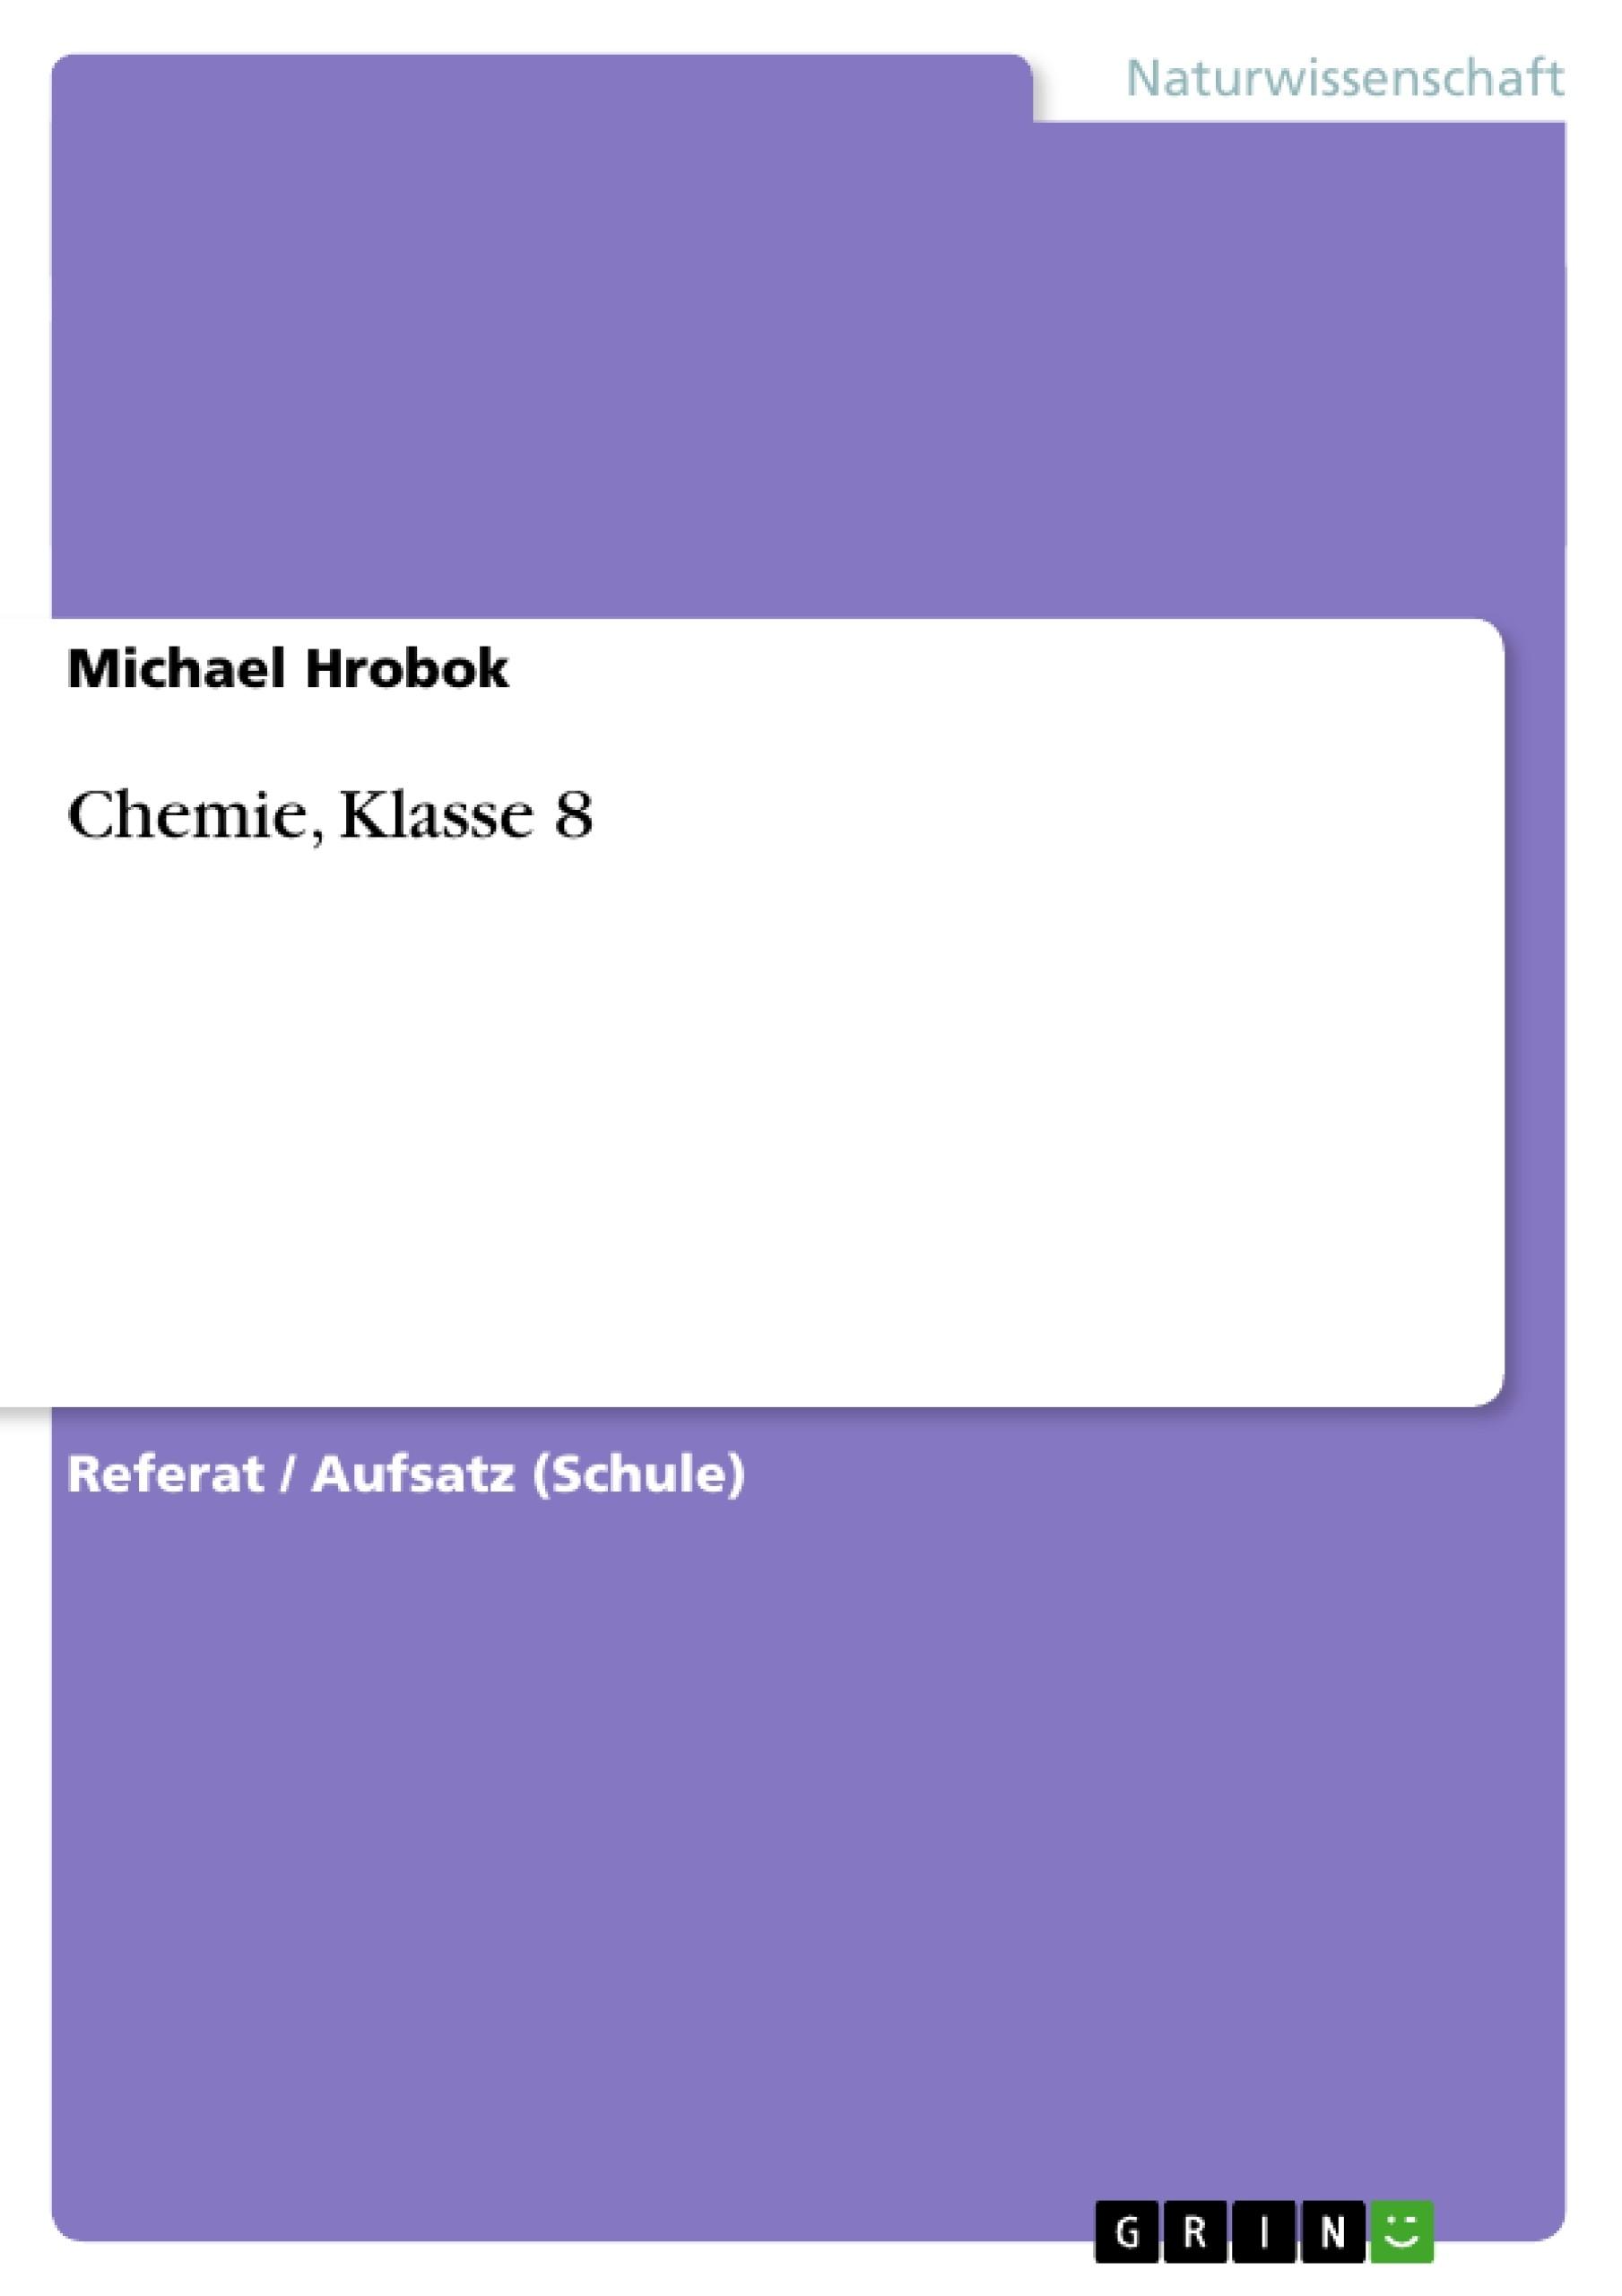 Chemie, Klasse 8 | Masterarbeit, Hausarbeit, Bachelorarbeit ...